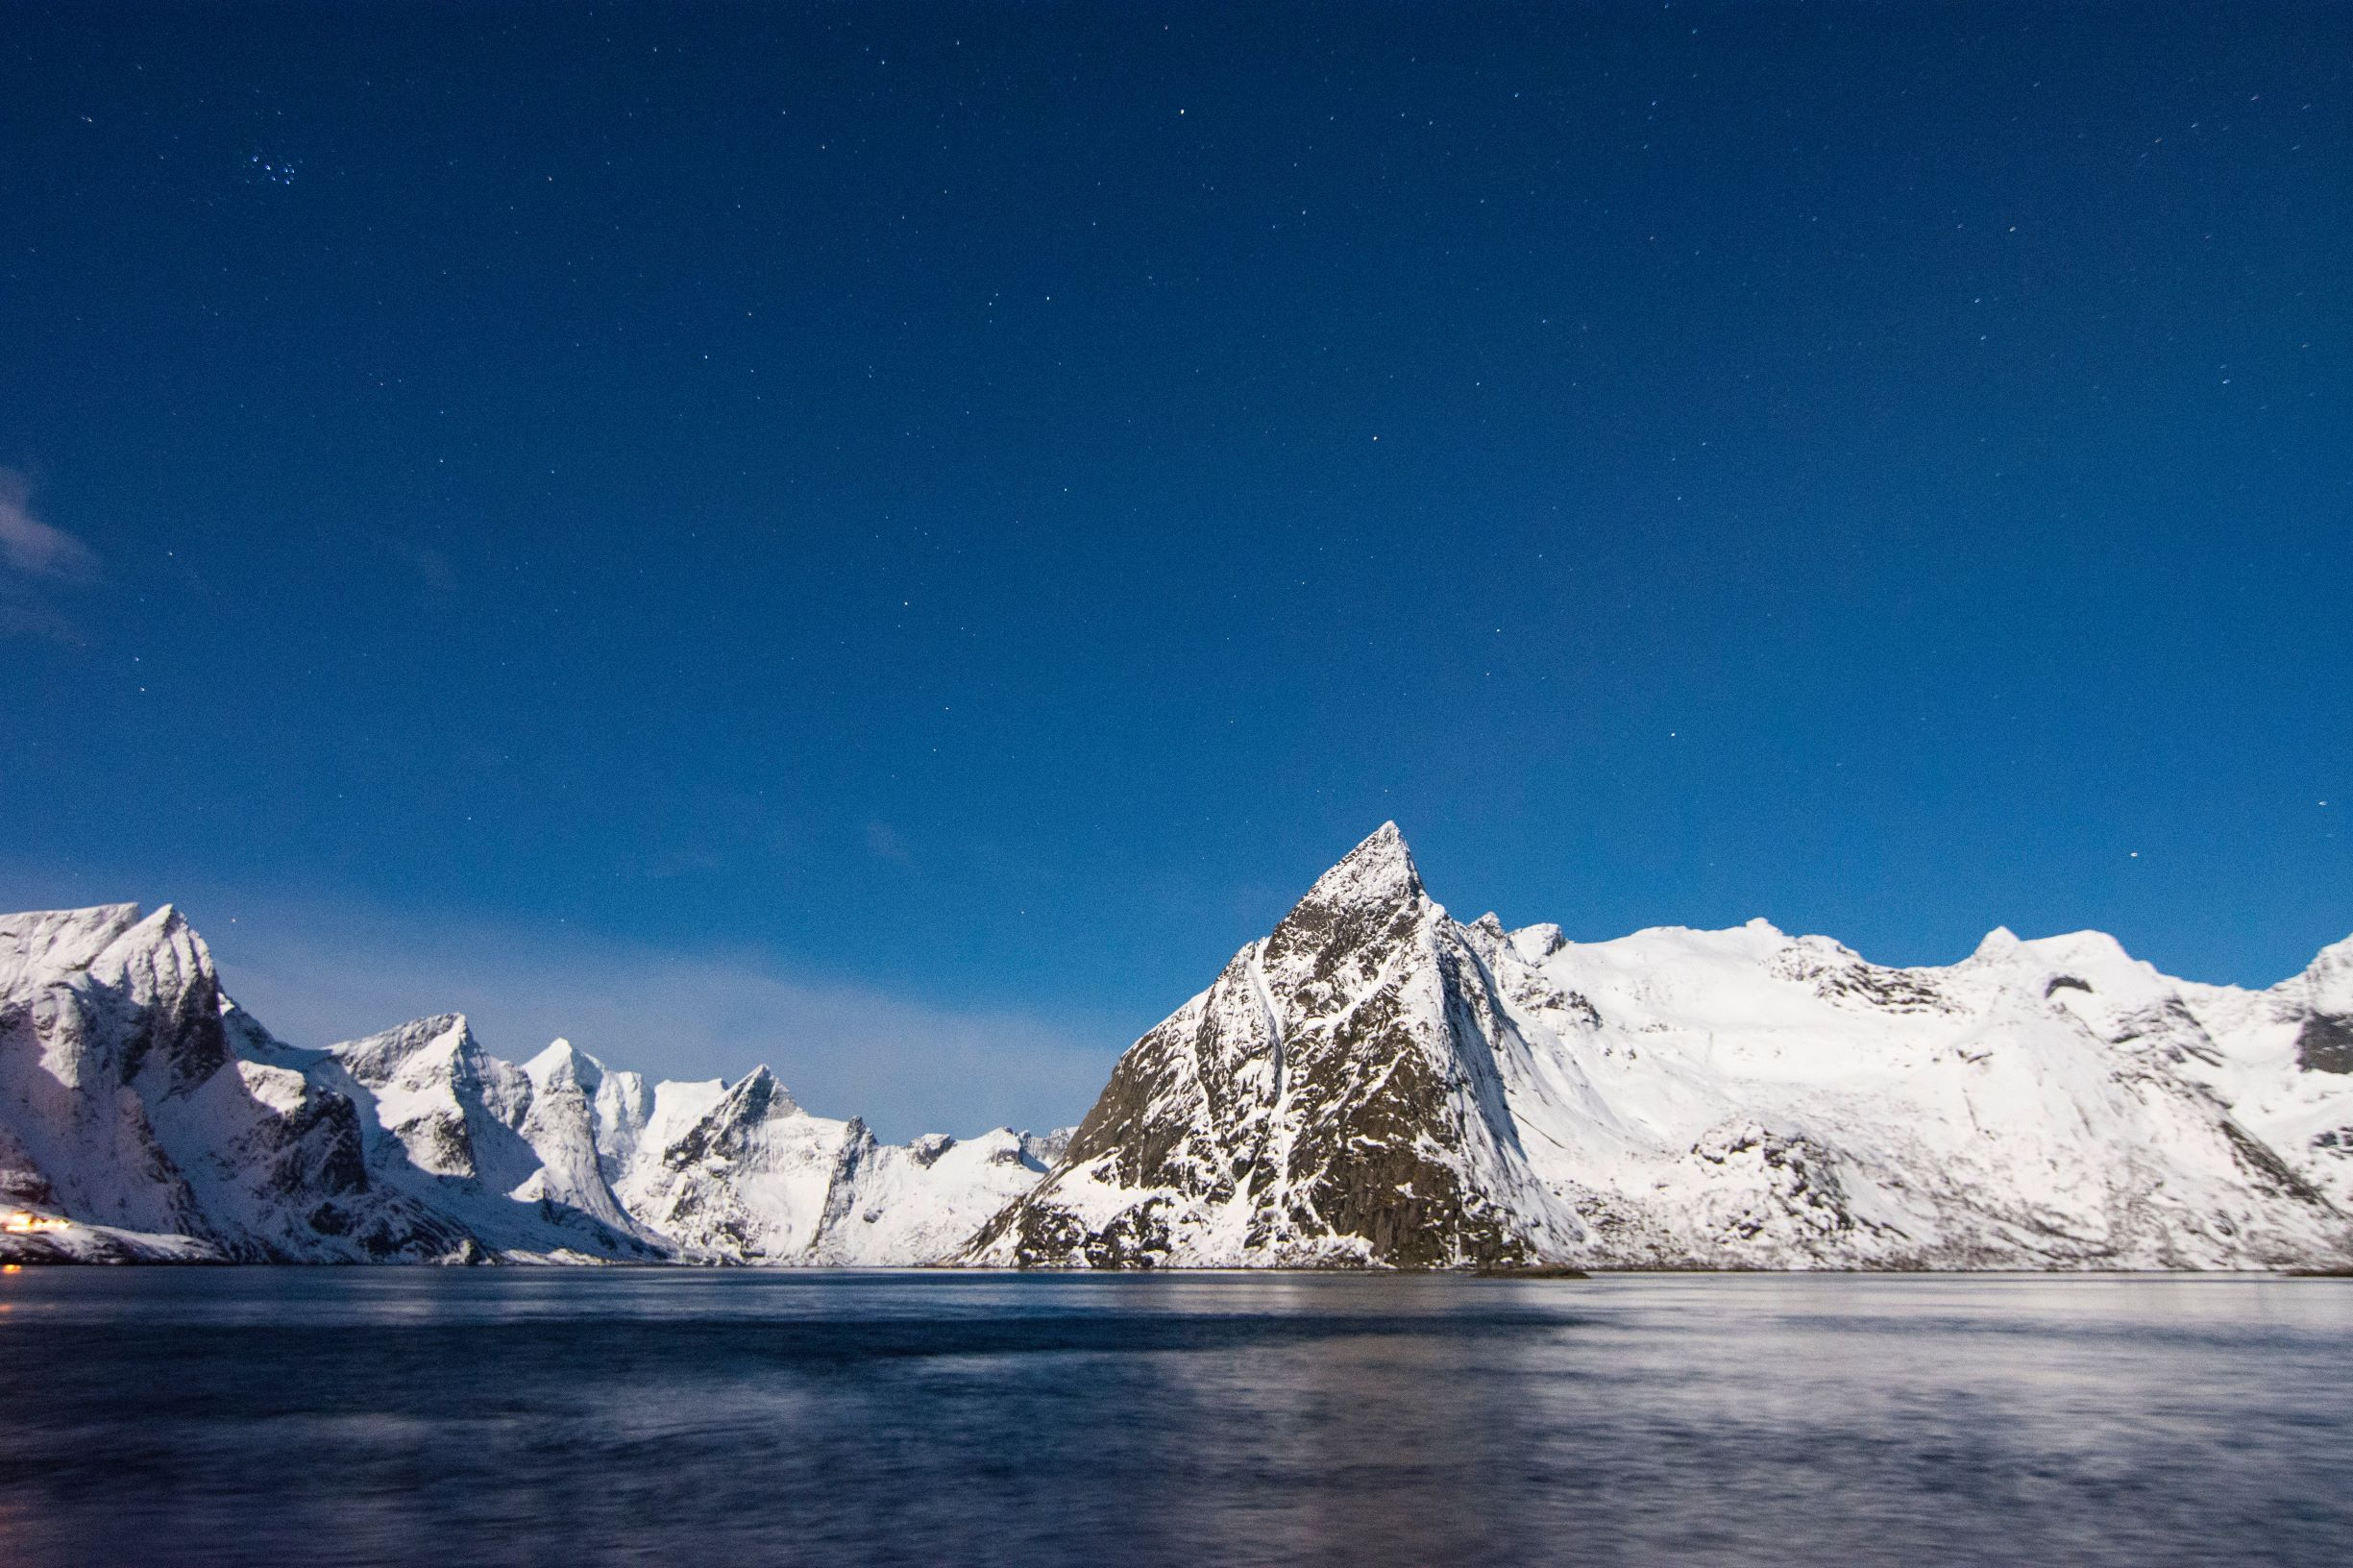 NY_jamie-macpherson-unsplash_blå himel snö